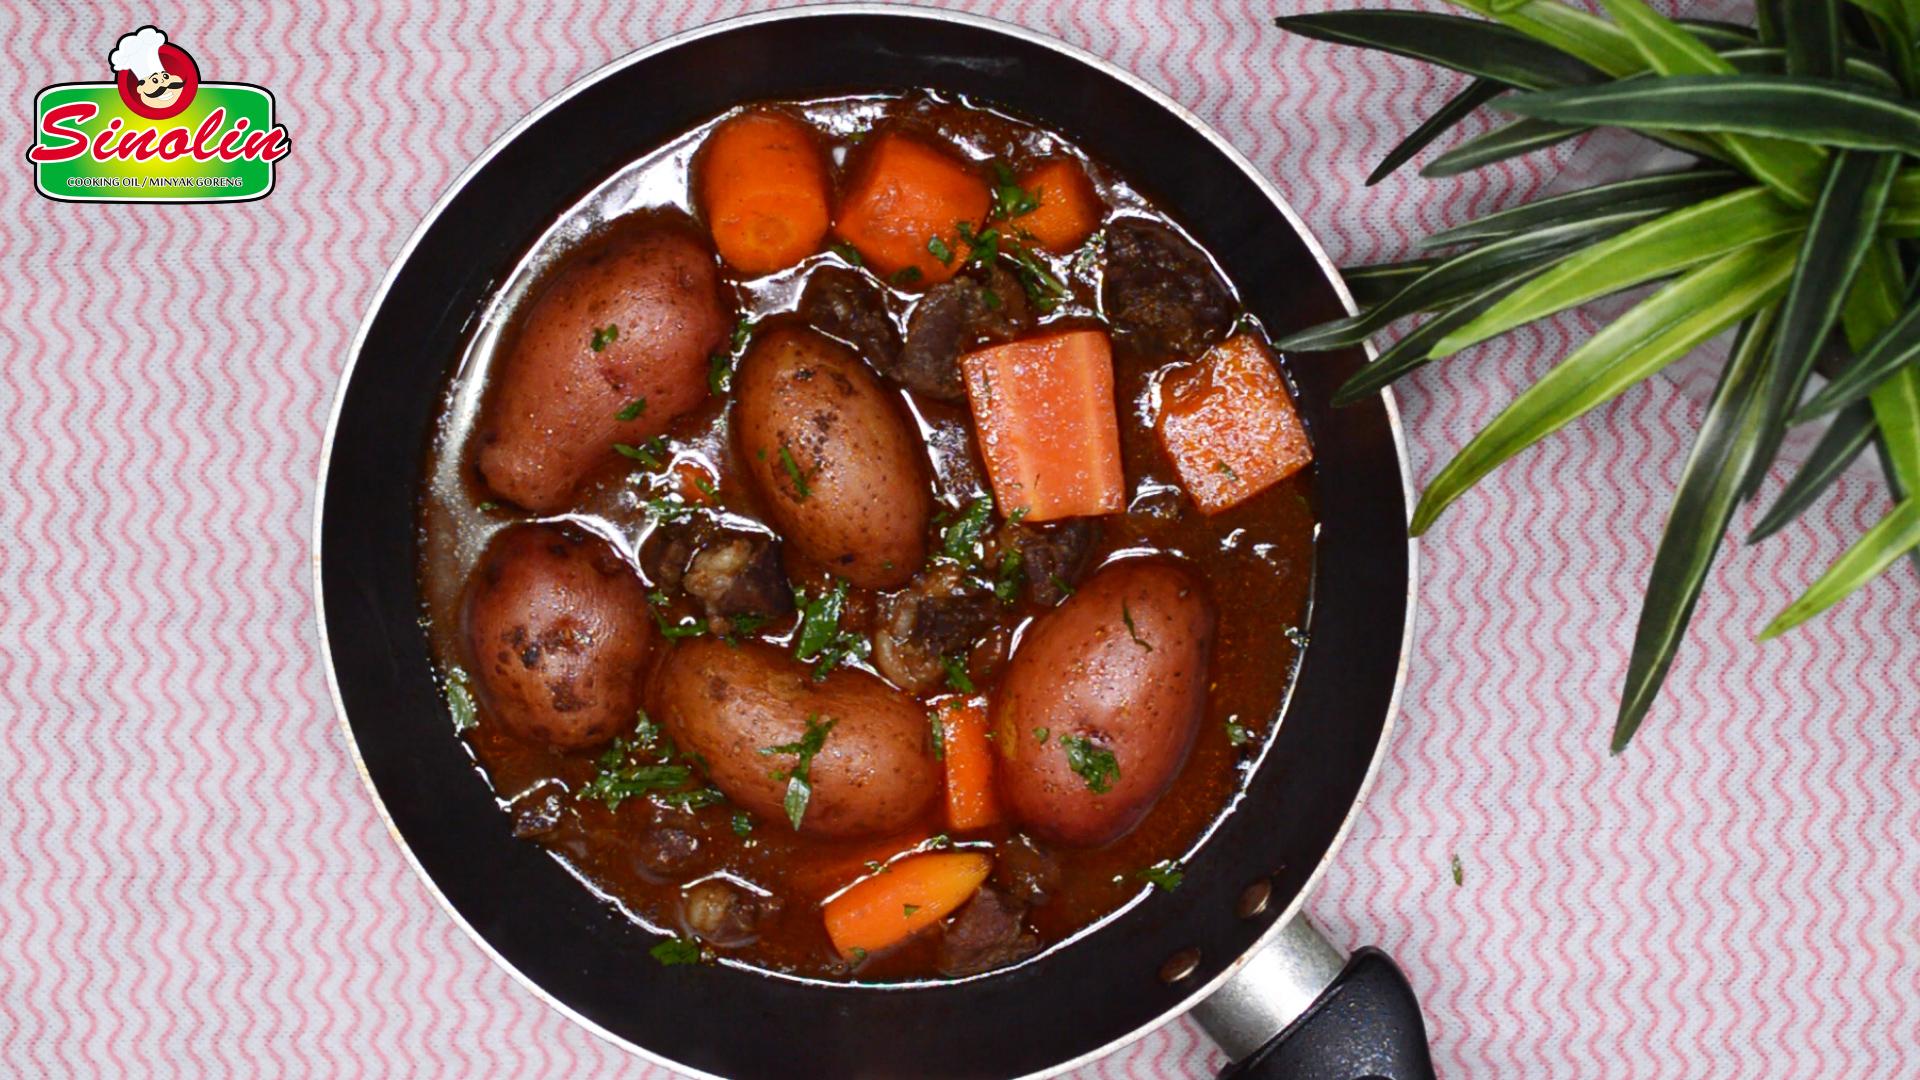 Dutch Soup by Dapur Sinolin